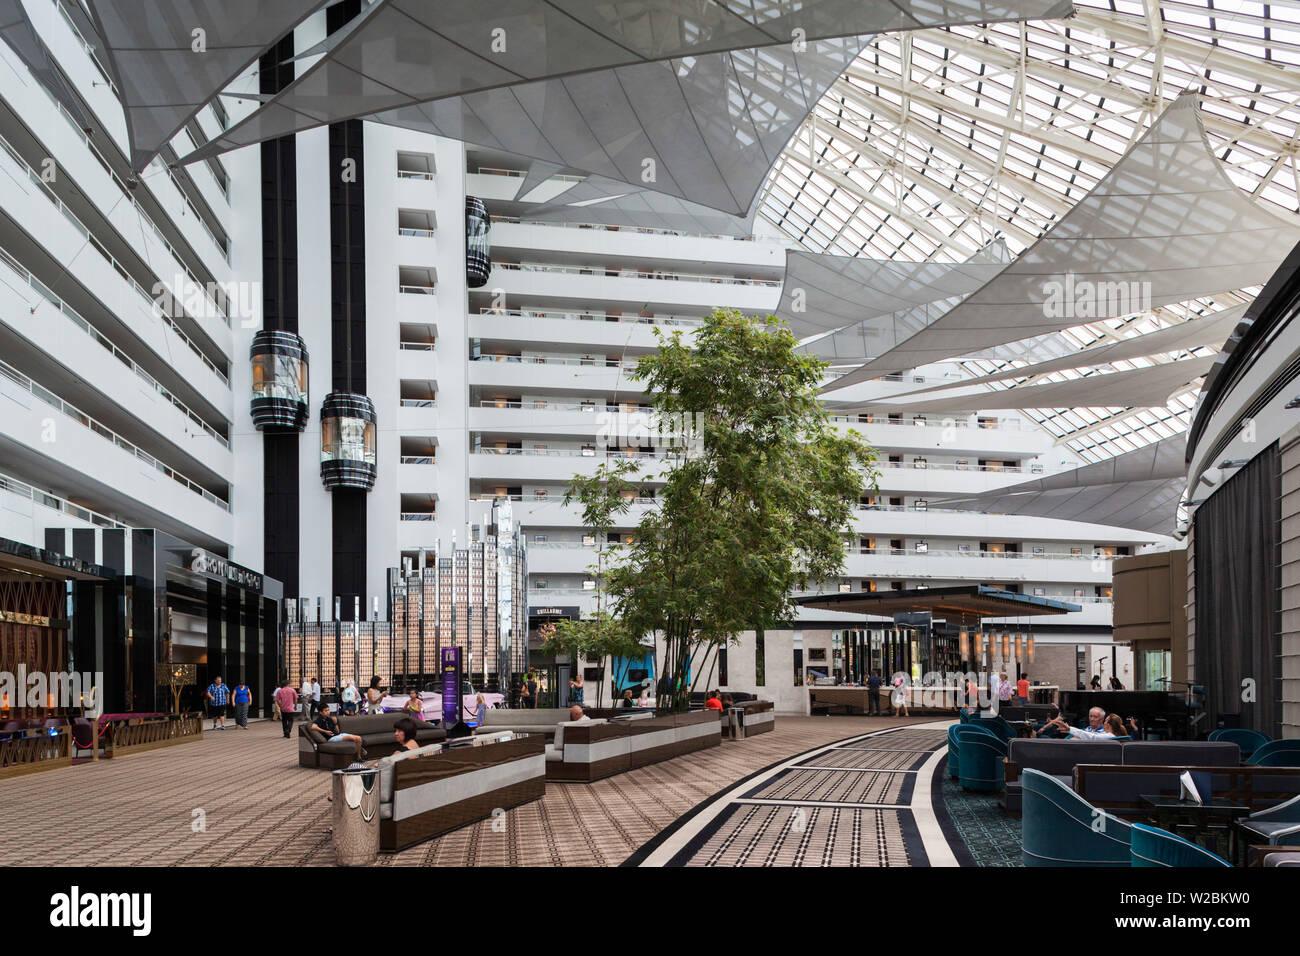 Australia, Western Australia, Perth-Burswood, Crown Perth Metropole Hotel, interior - Stock Image